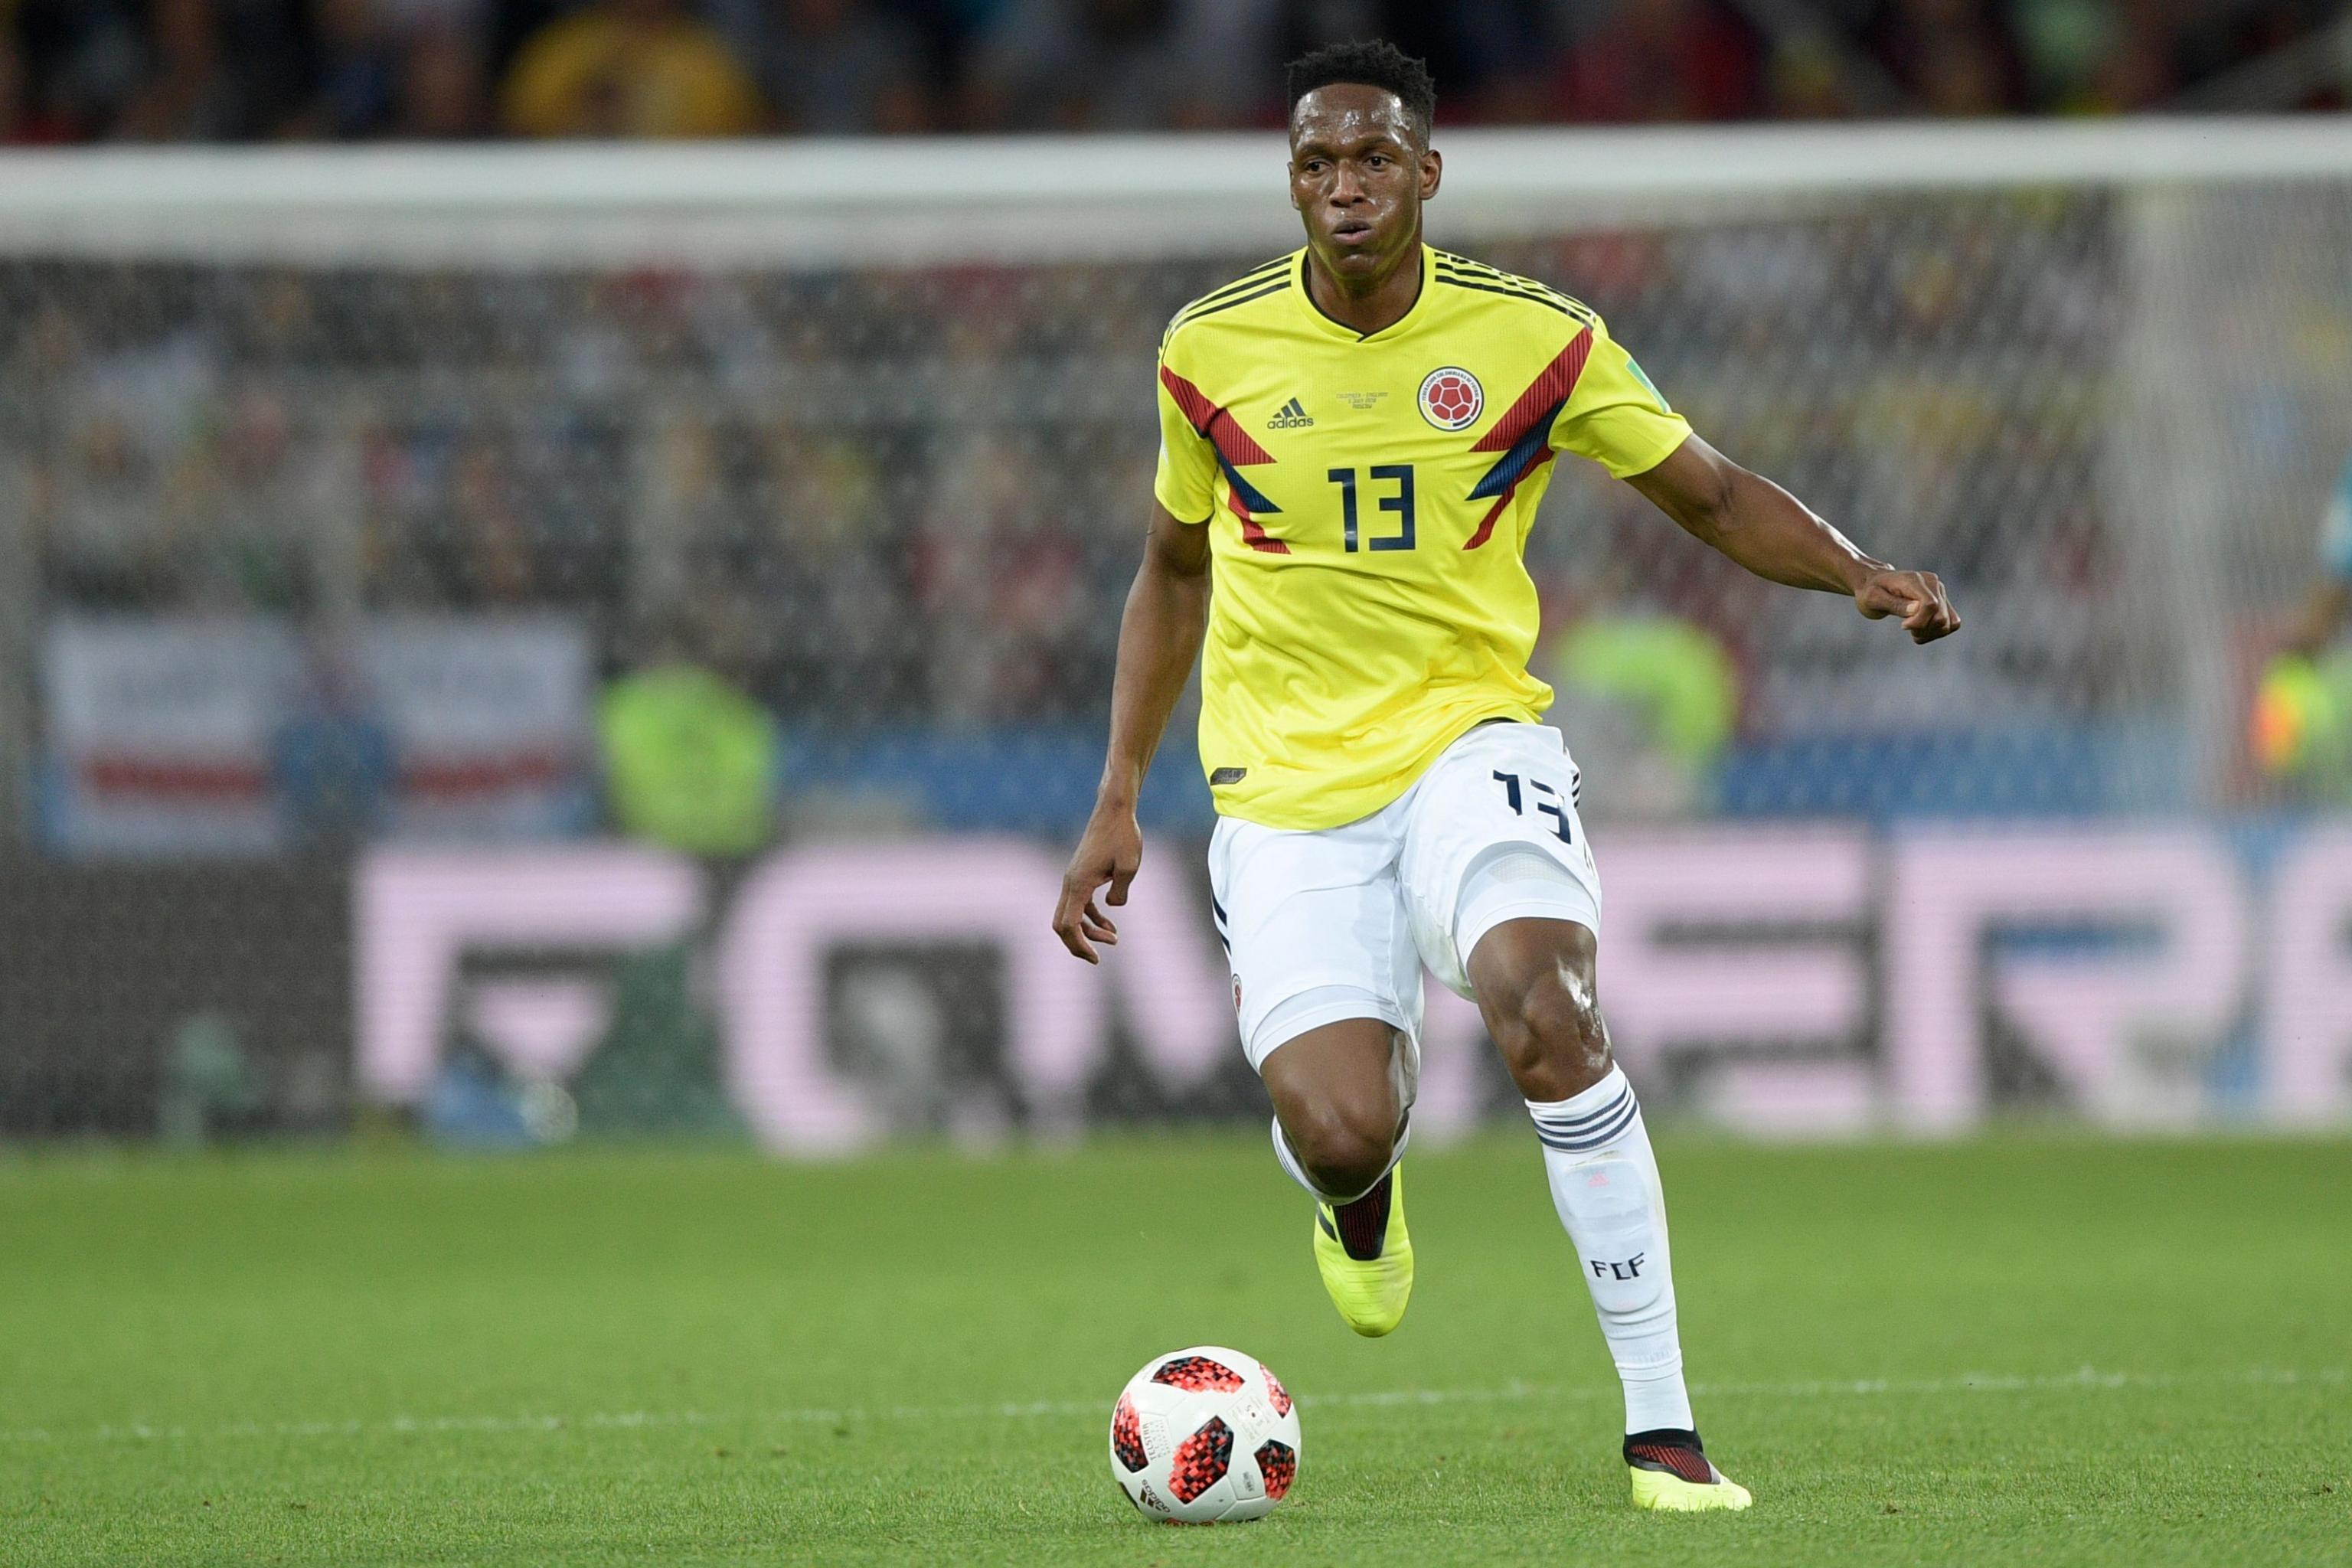 Barcelona Transfer News Everton Make Yerry Mina Bid In Latest Rumours Bleacher Report Latest News Videos And Highlights